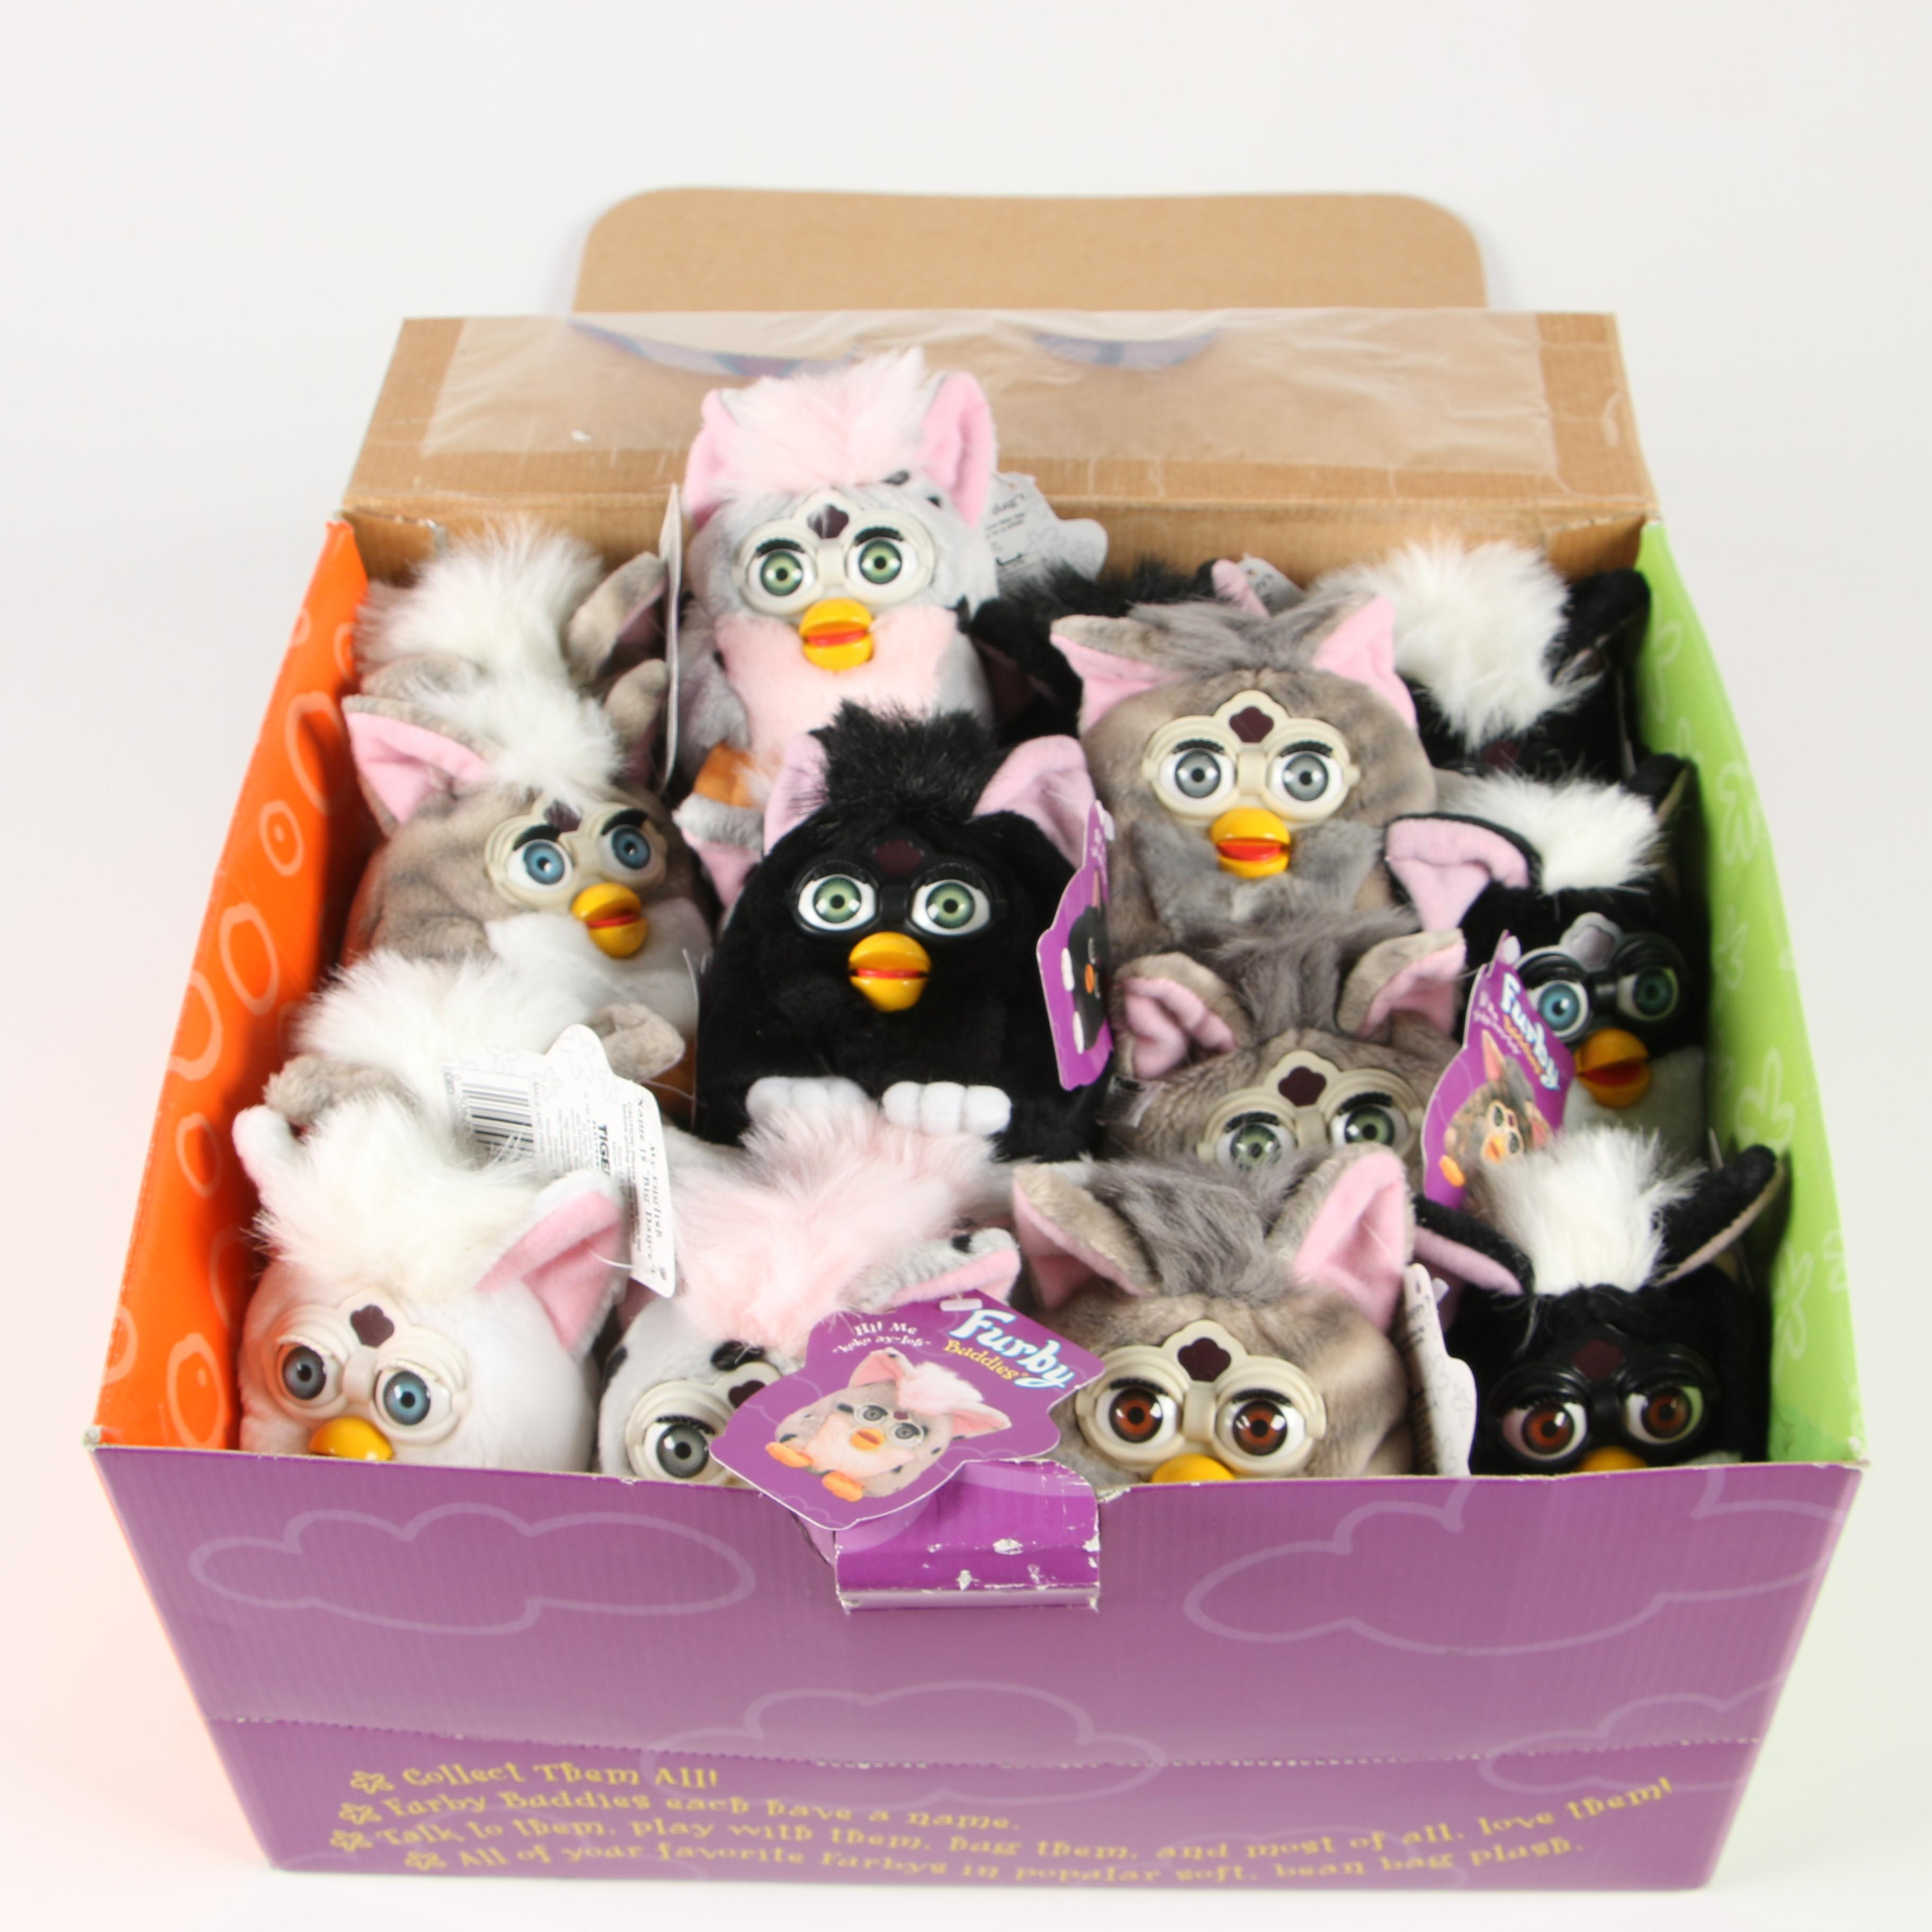 Stuffed Furby Buddies with Counter Display Box, 1999